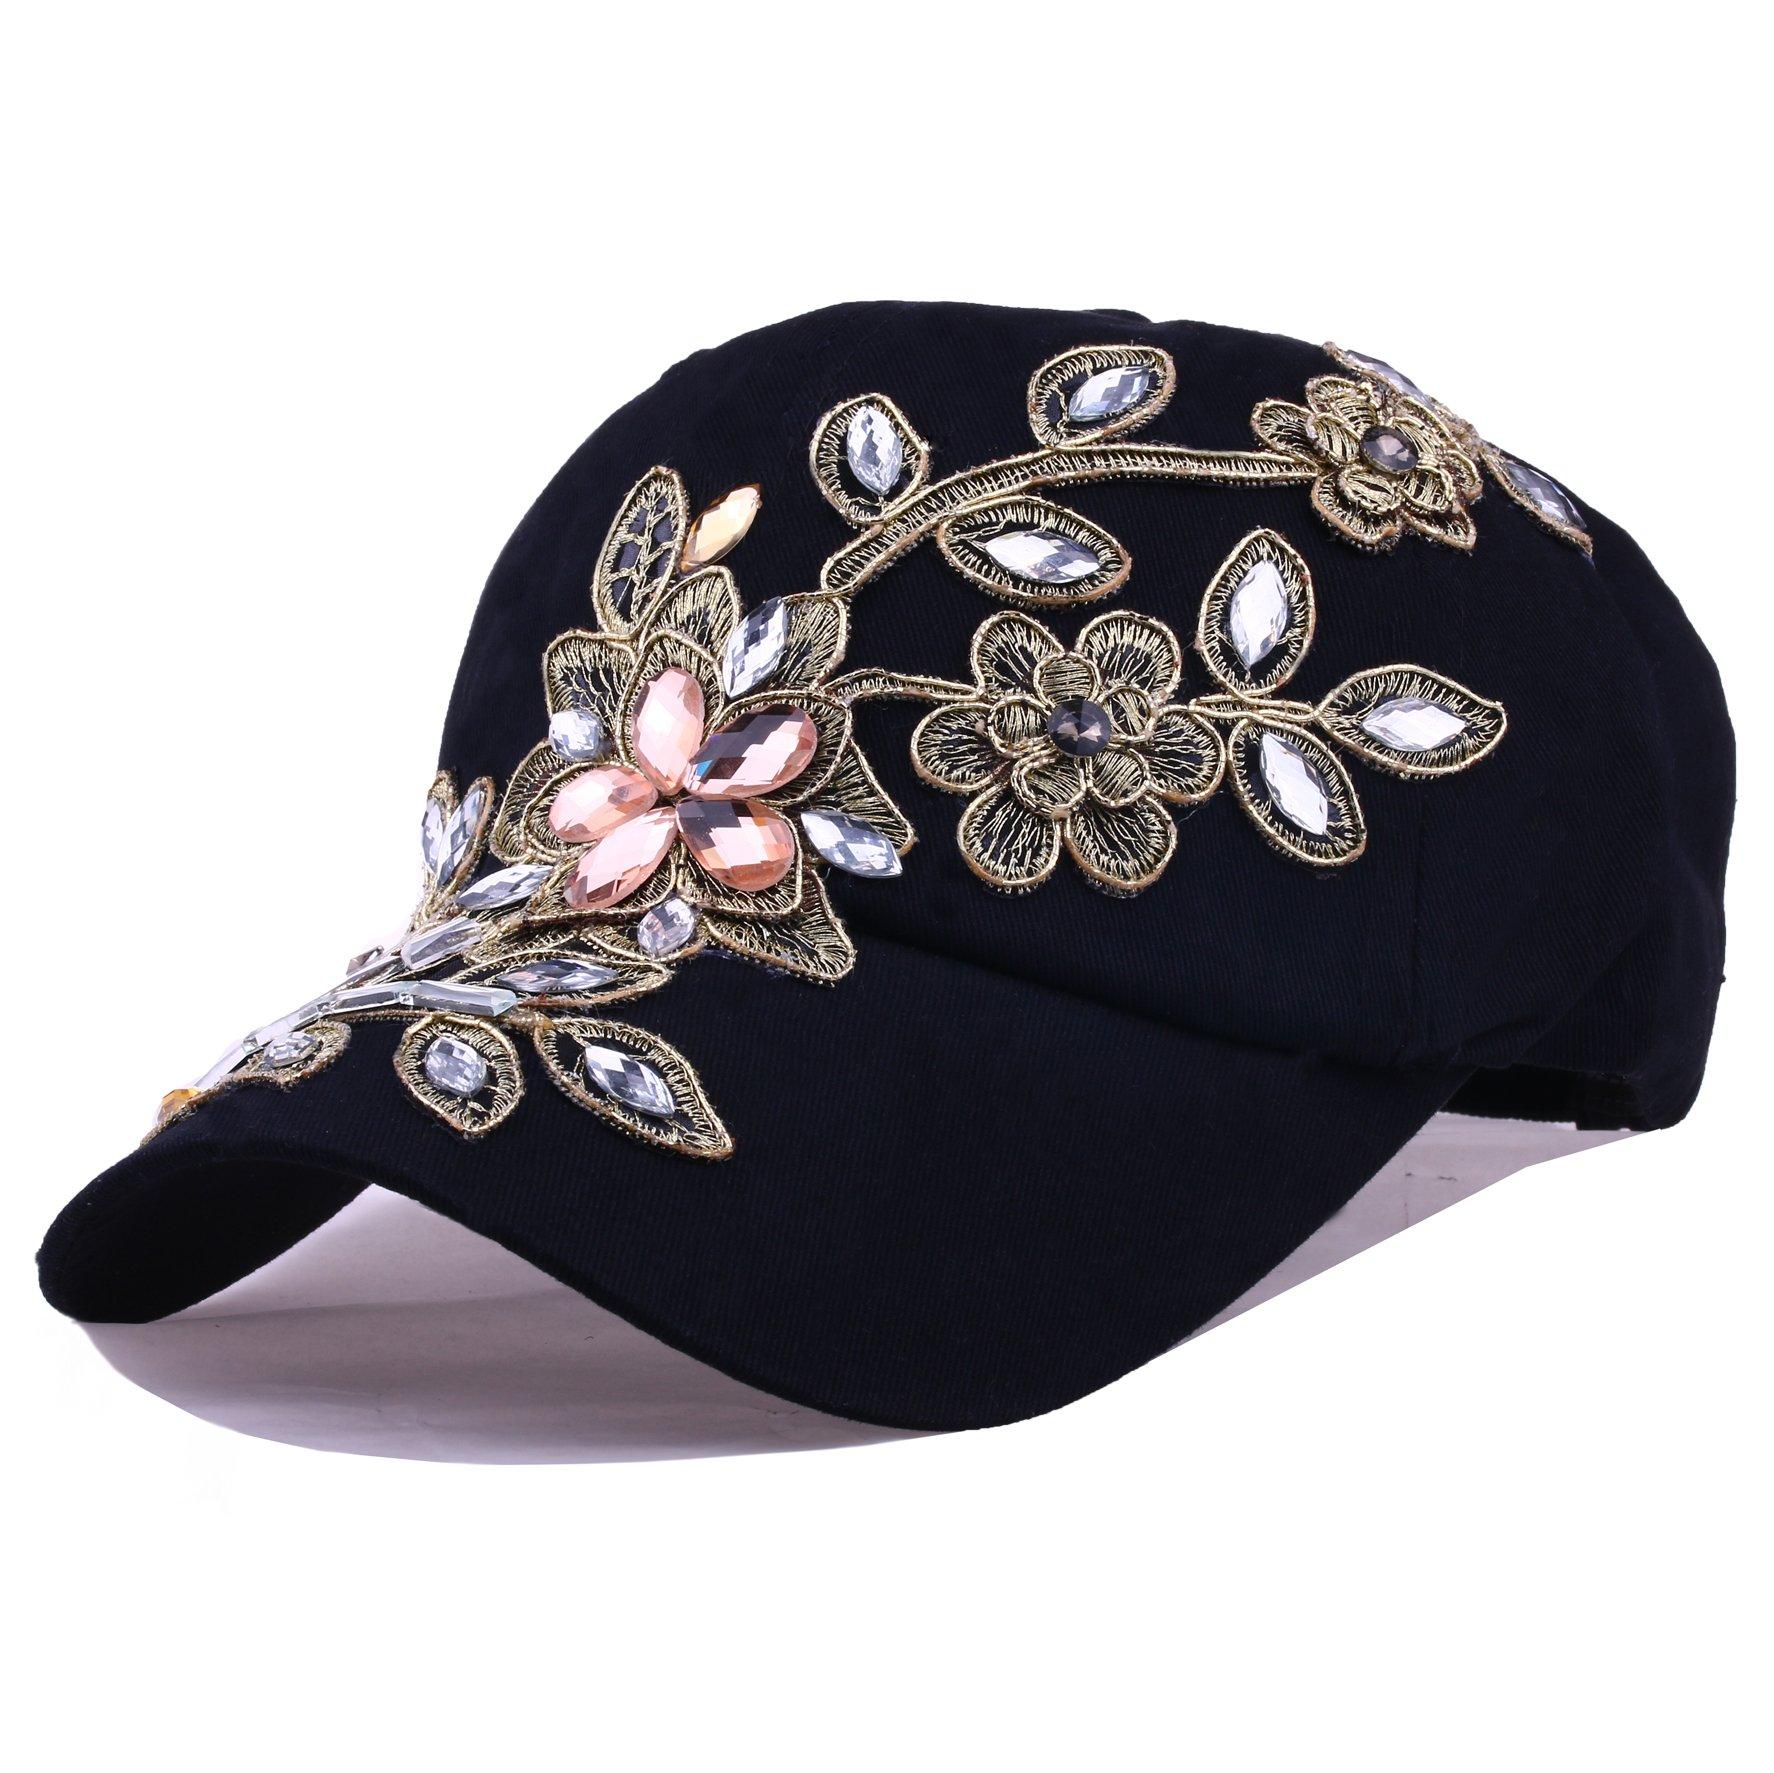 ca991947765 Deer Mum Ladies Denim Jean Campagne Bling Ajustable Baseball Cap Cowboy Hat(flower  1) (Black) - Jeanhat-zm-flower1-black   Baseball Caps   Clothing